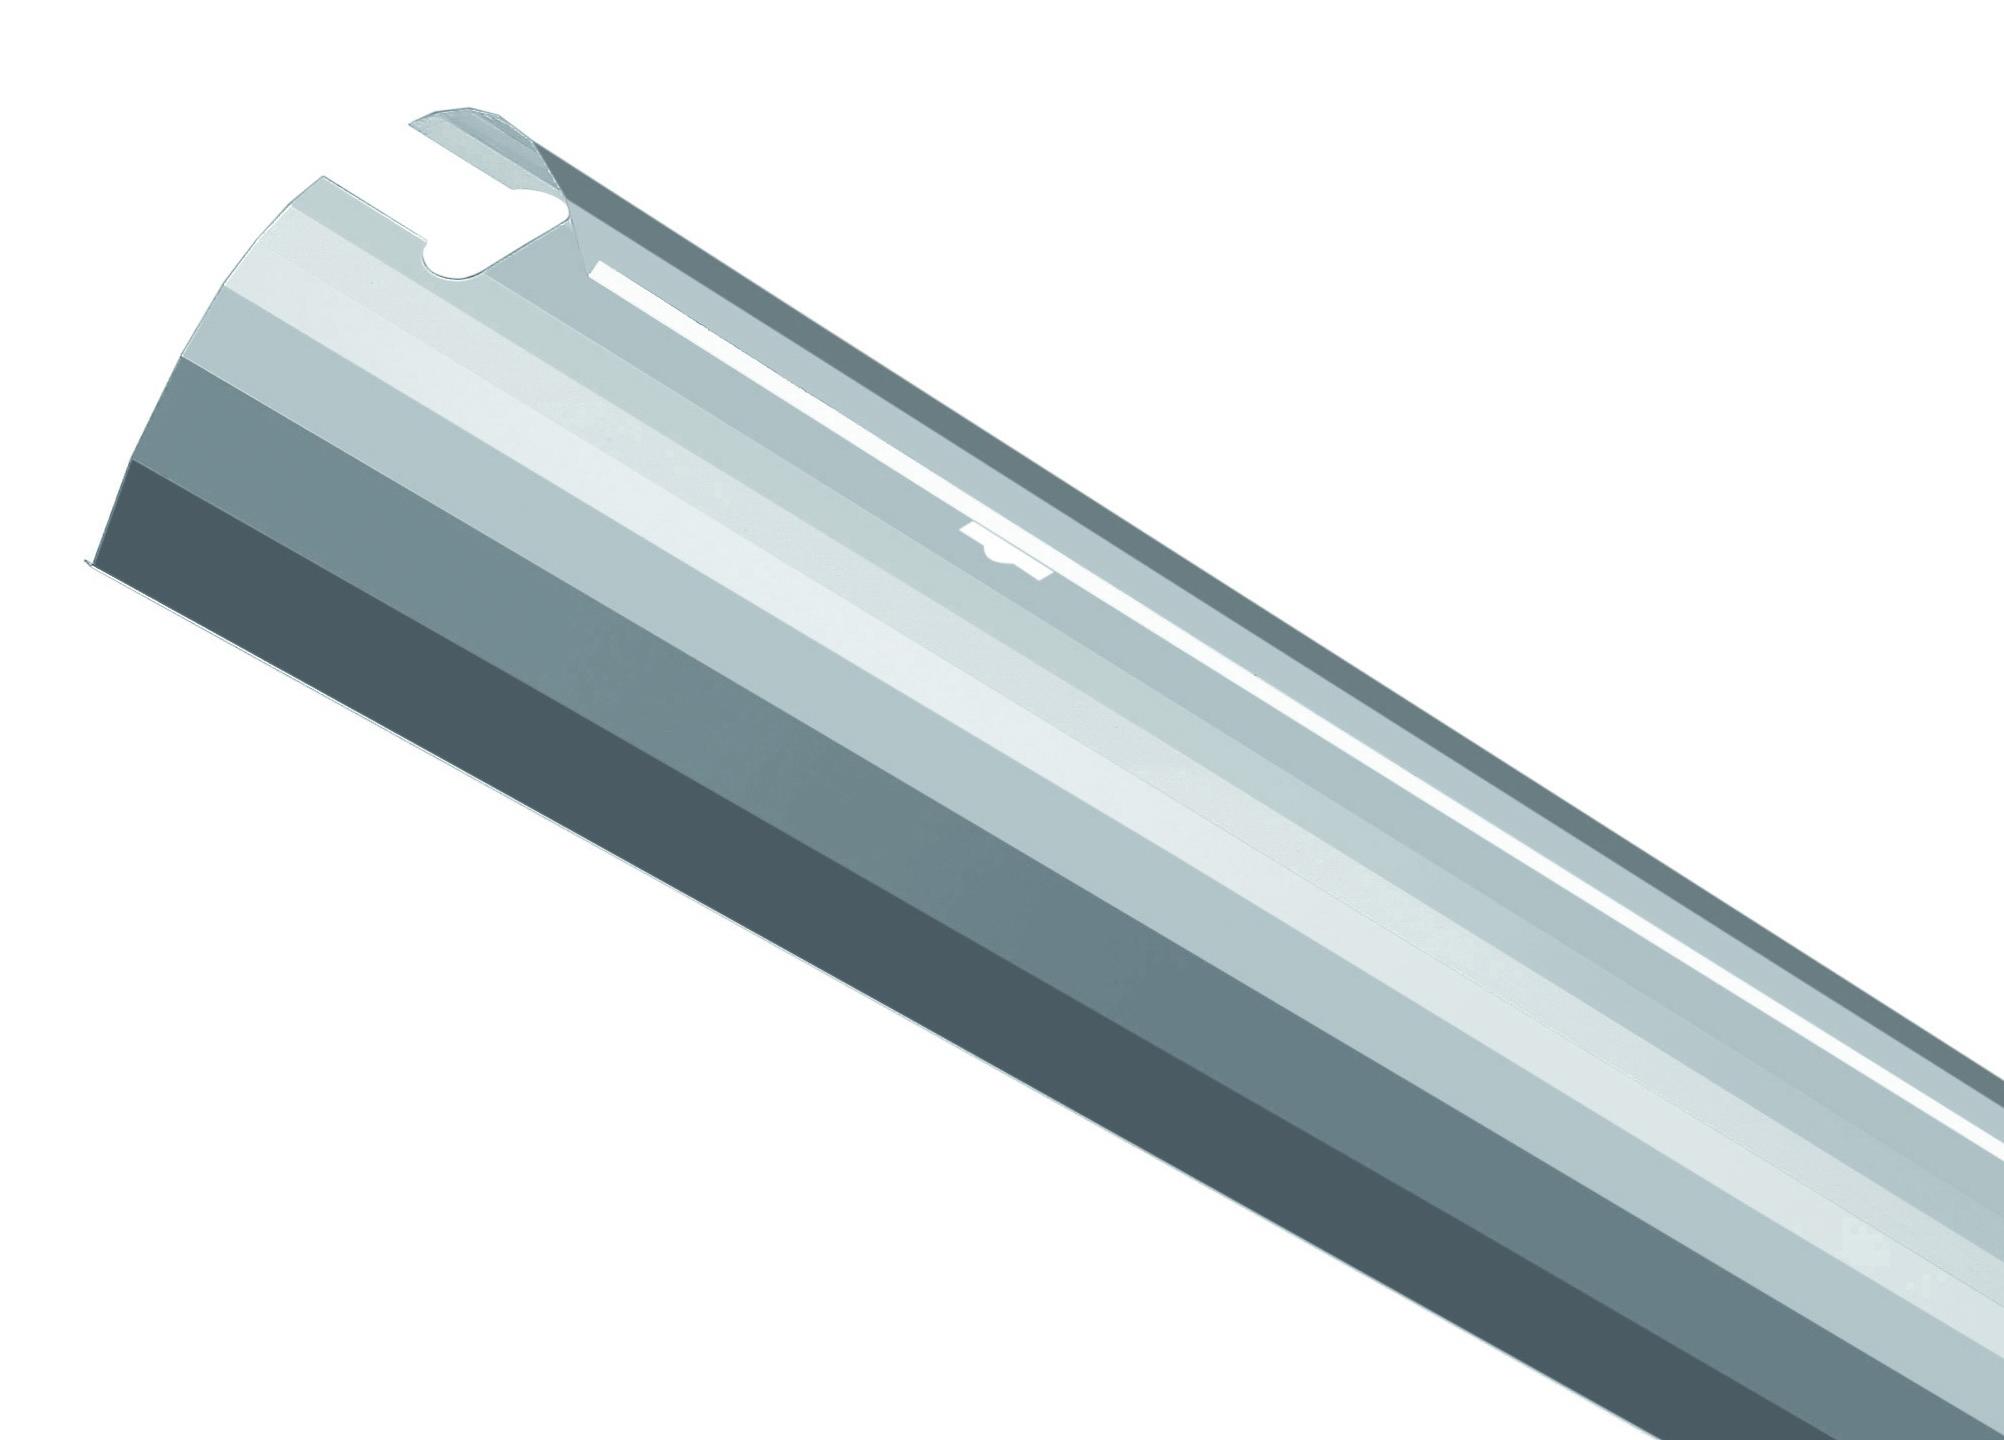 1 Stk L-SE Reflektor R12 T8 AL 58W alu, EVG, tiefstrahlend LI99000124